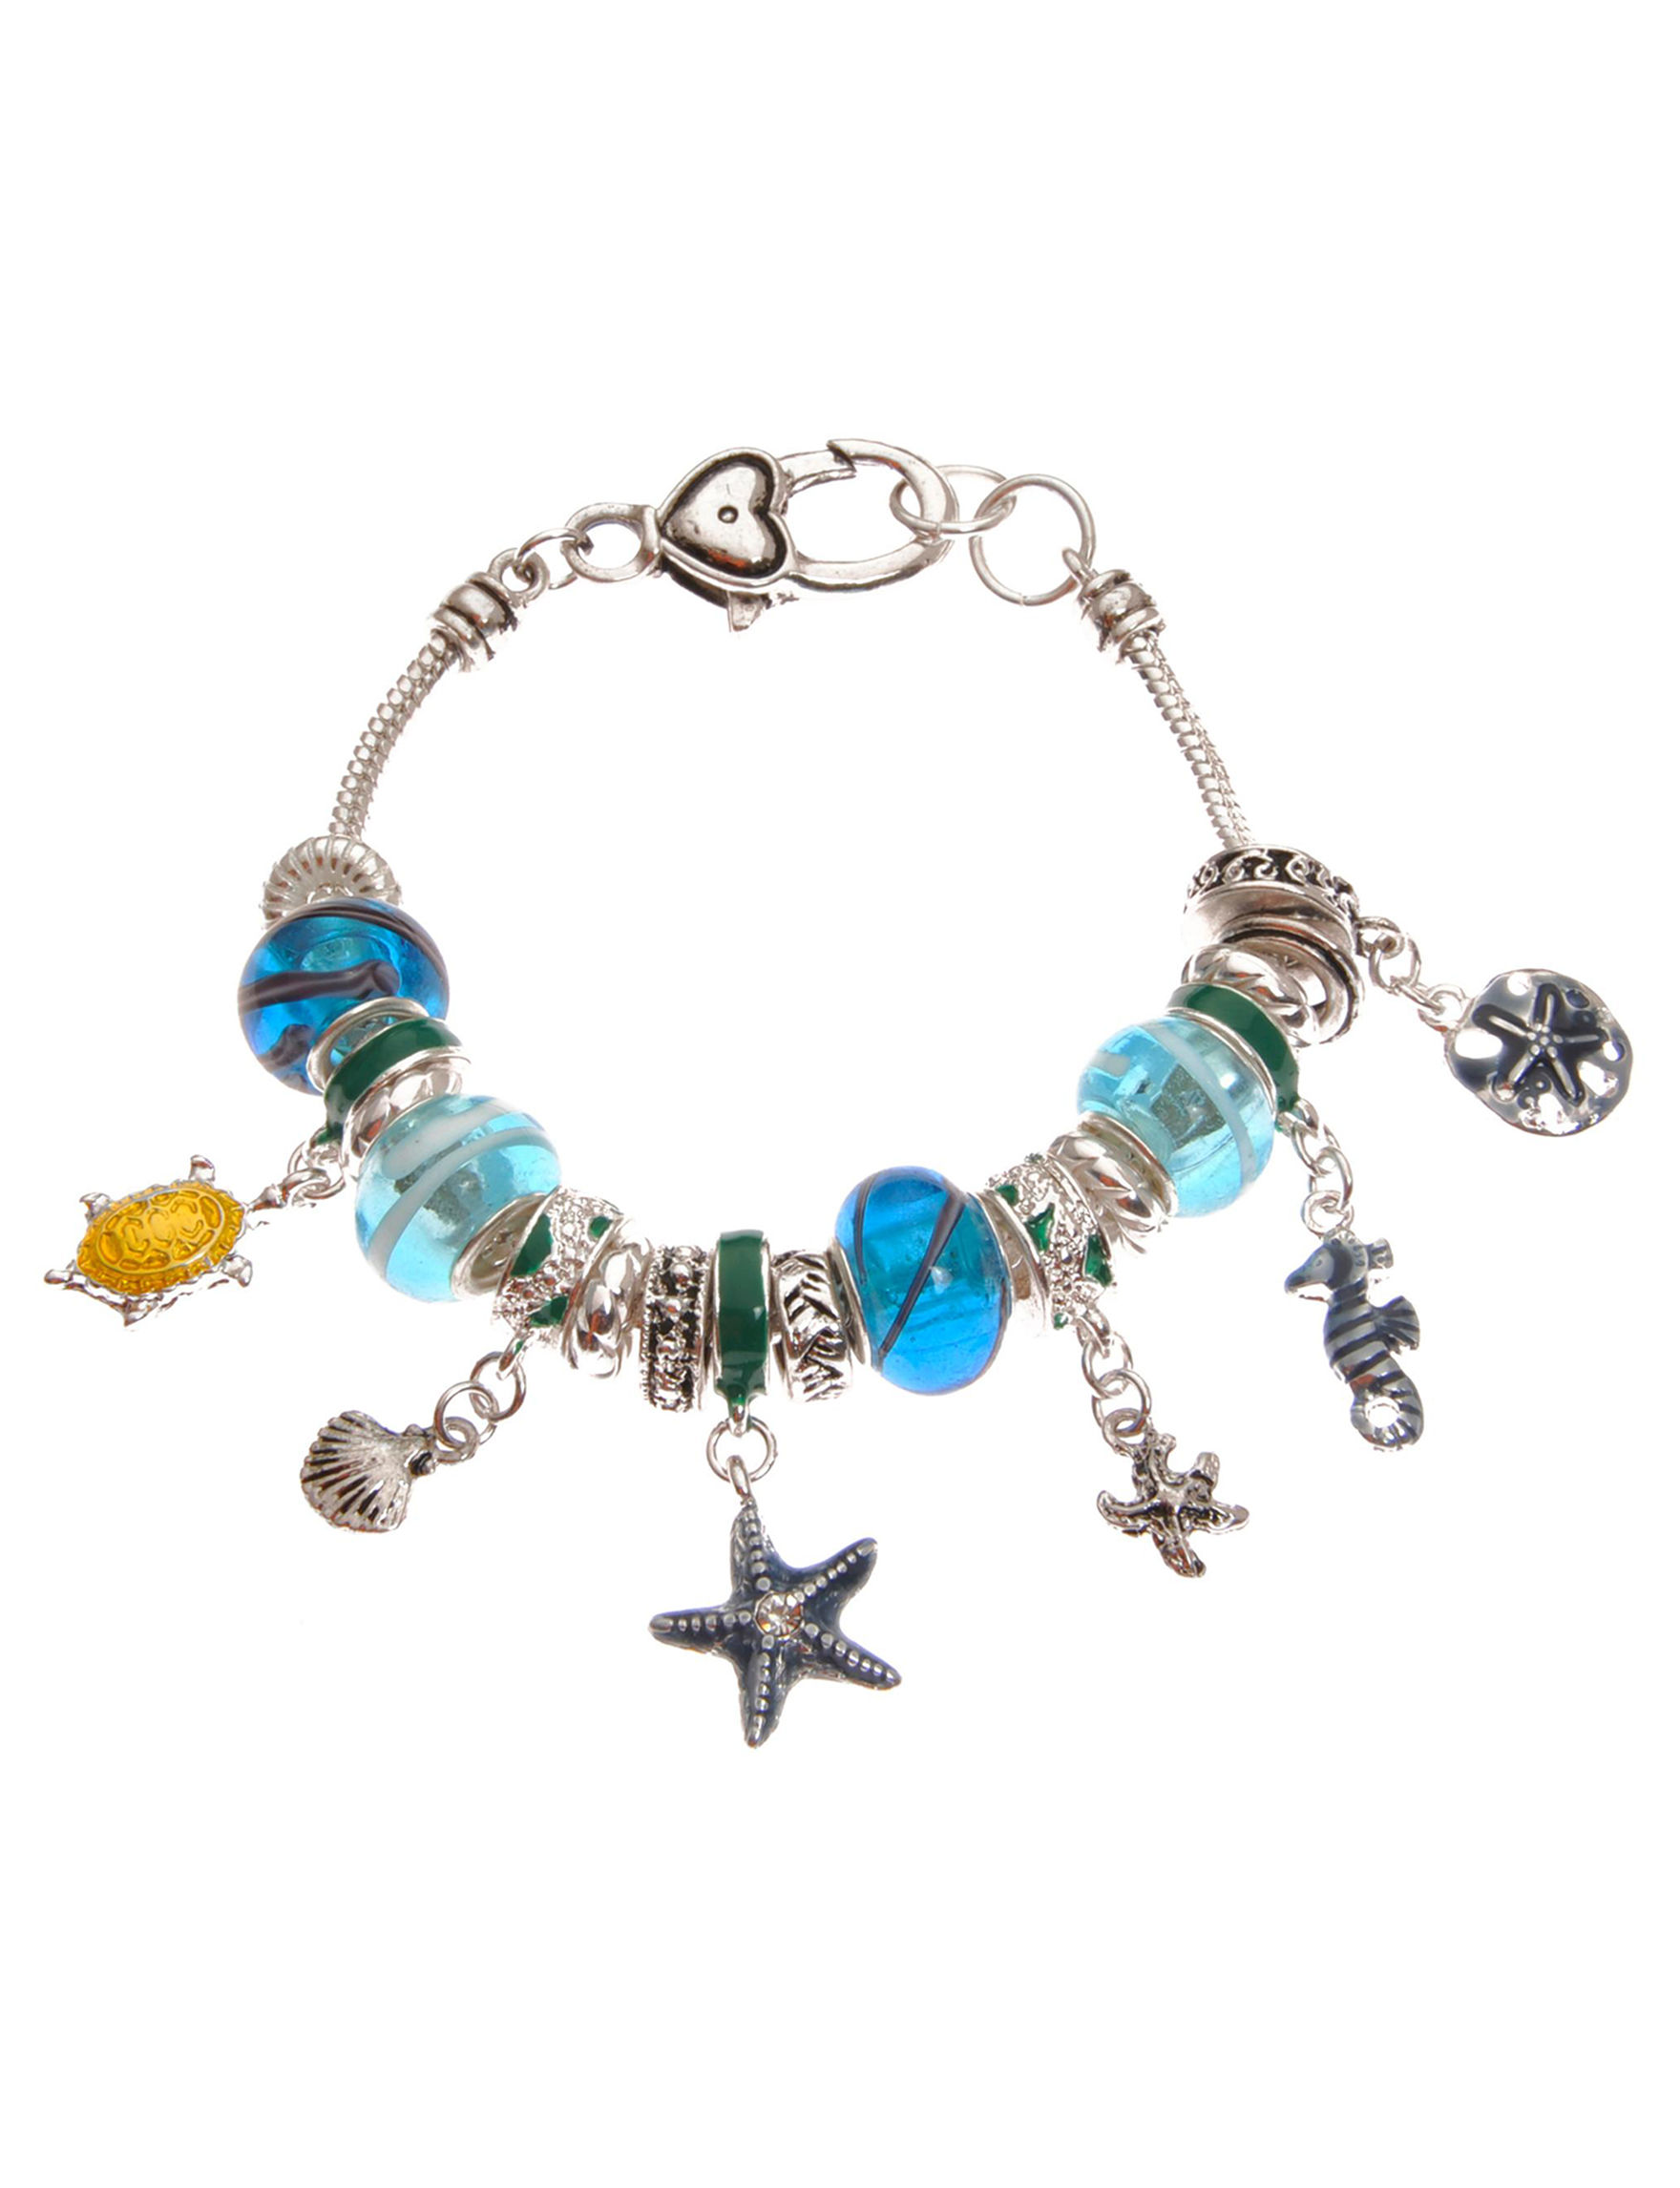 L & J Blue / Silver Bracelets Fashion Jewelry